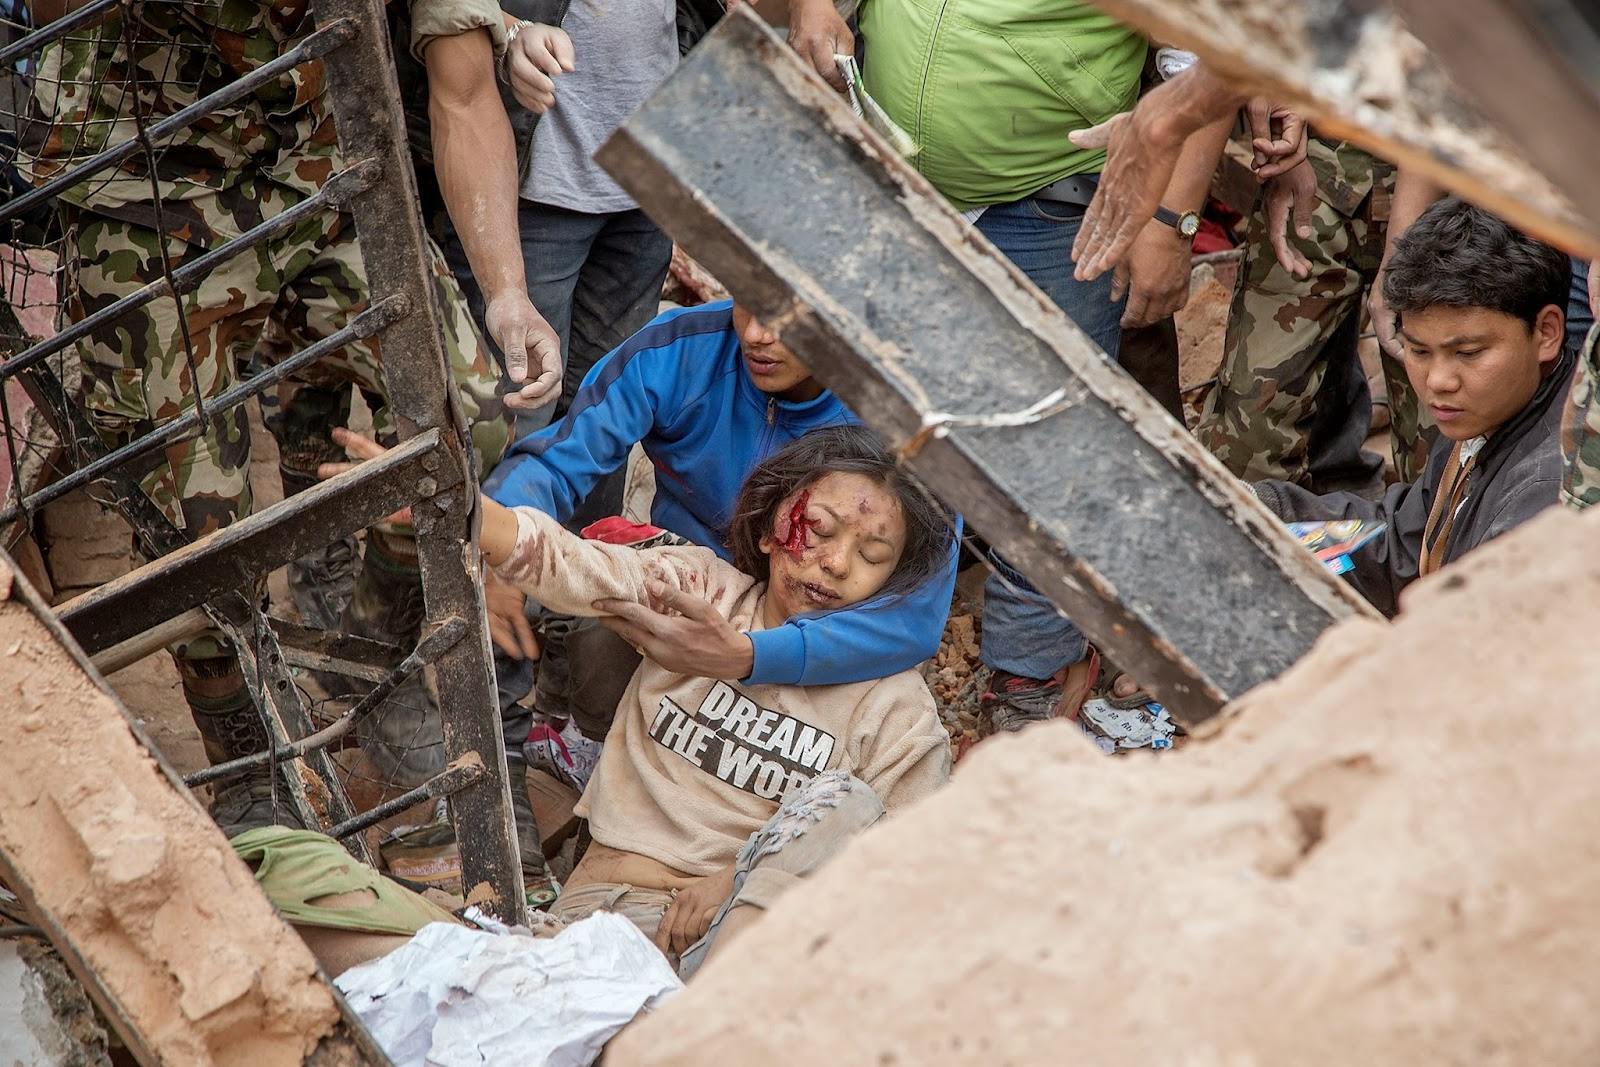 Nepal Earthquake 2015 Photos | Hiru Gossip Lanka